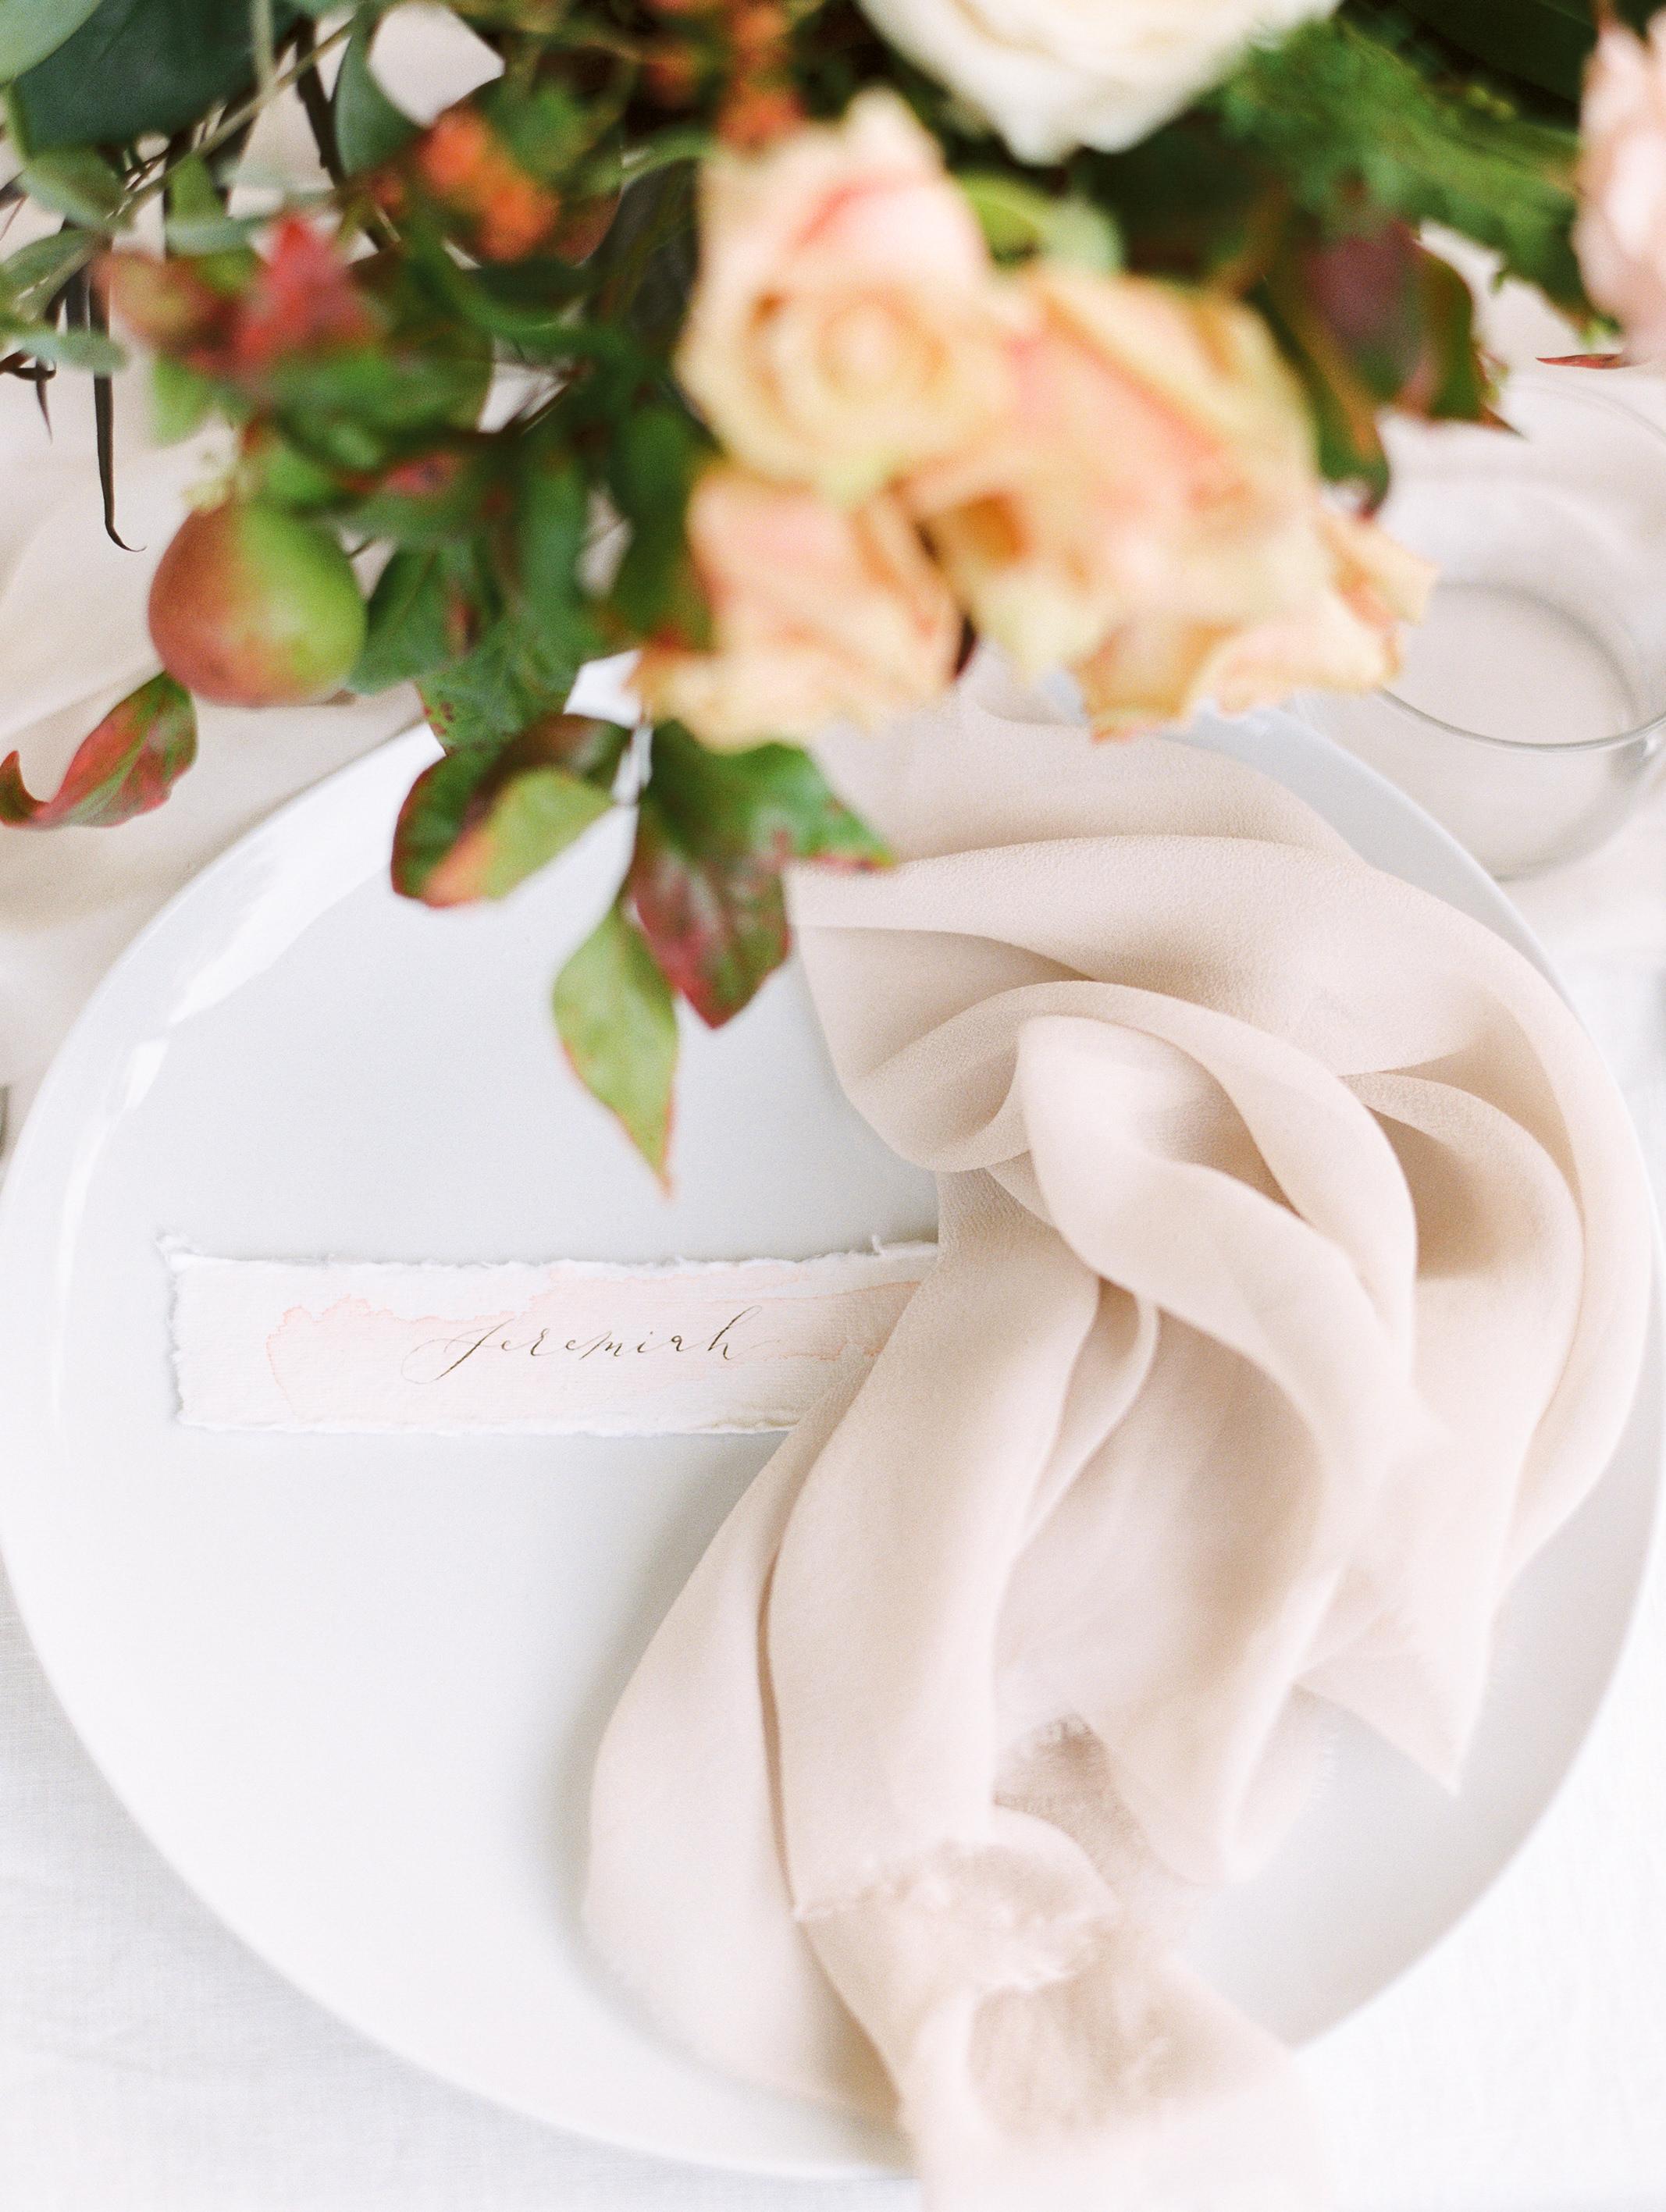 sandra-chau-stylist-floral-florist-branding-lifestyle-shoot-we-are-origami016.jpg